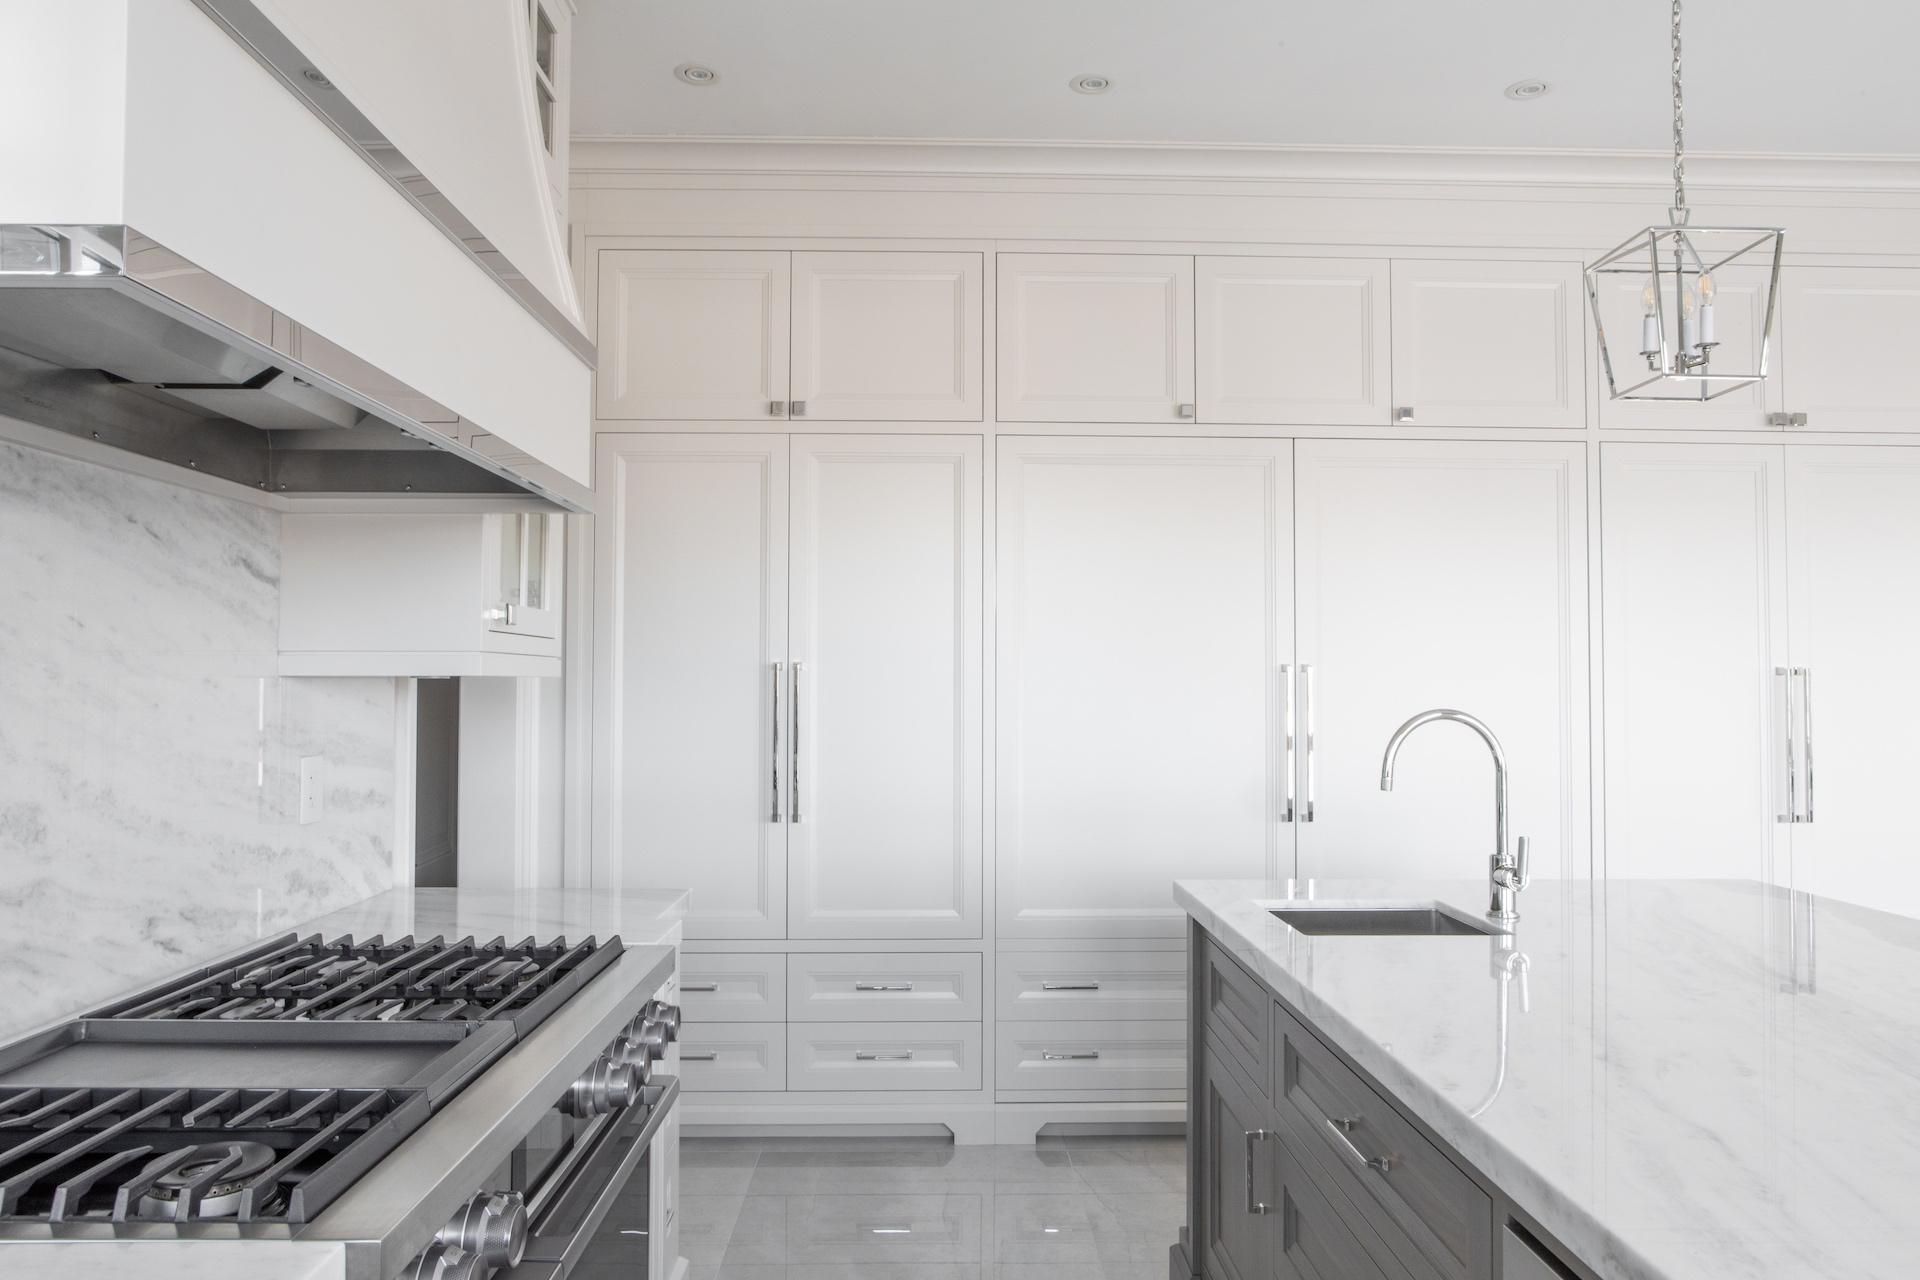 Stove, island and cabinets